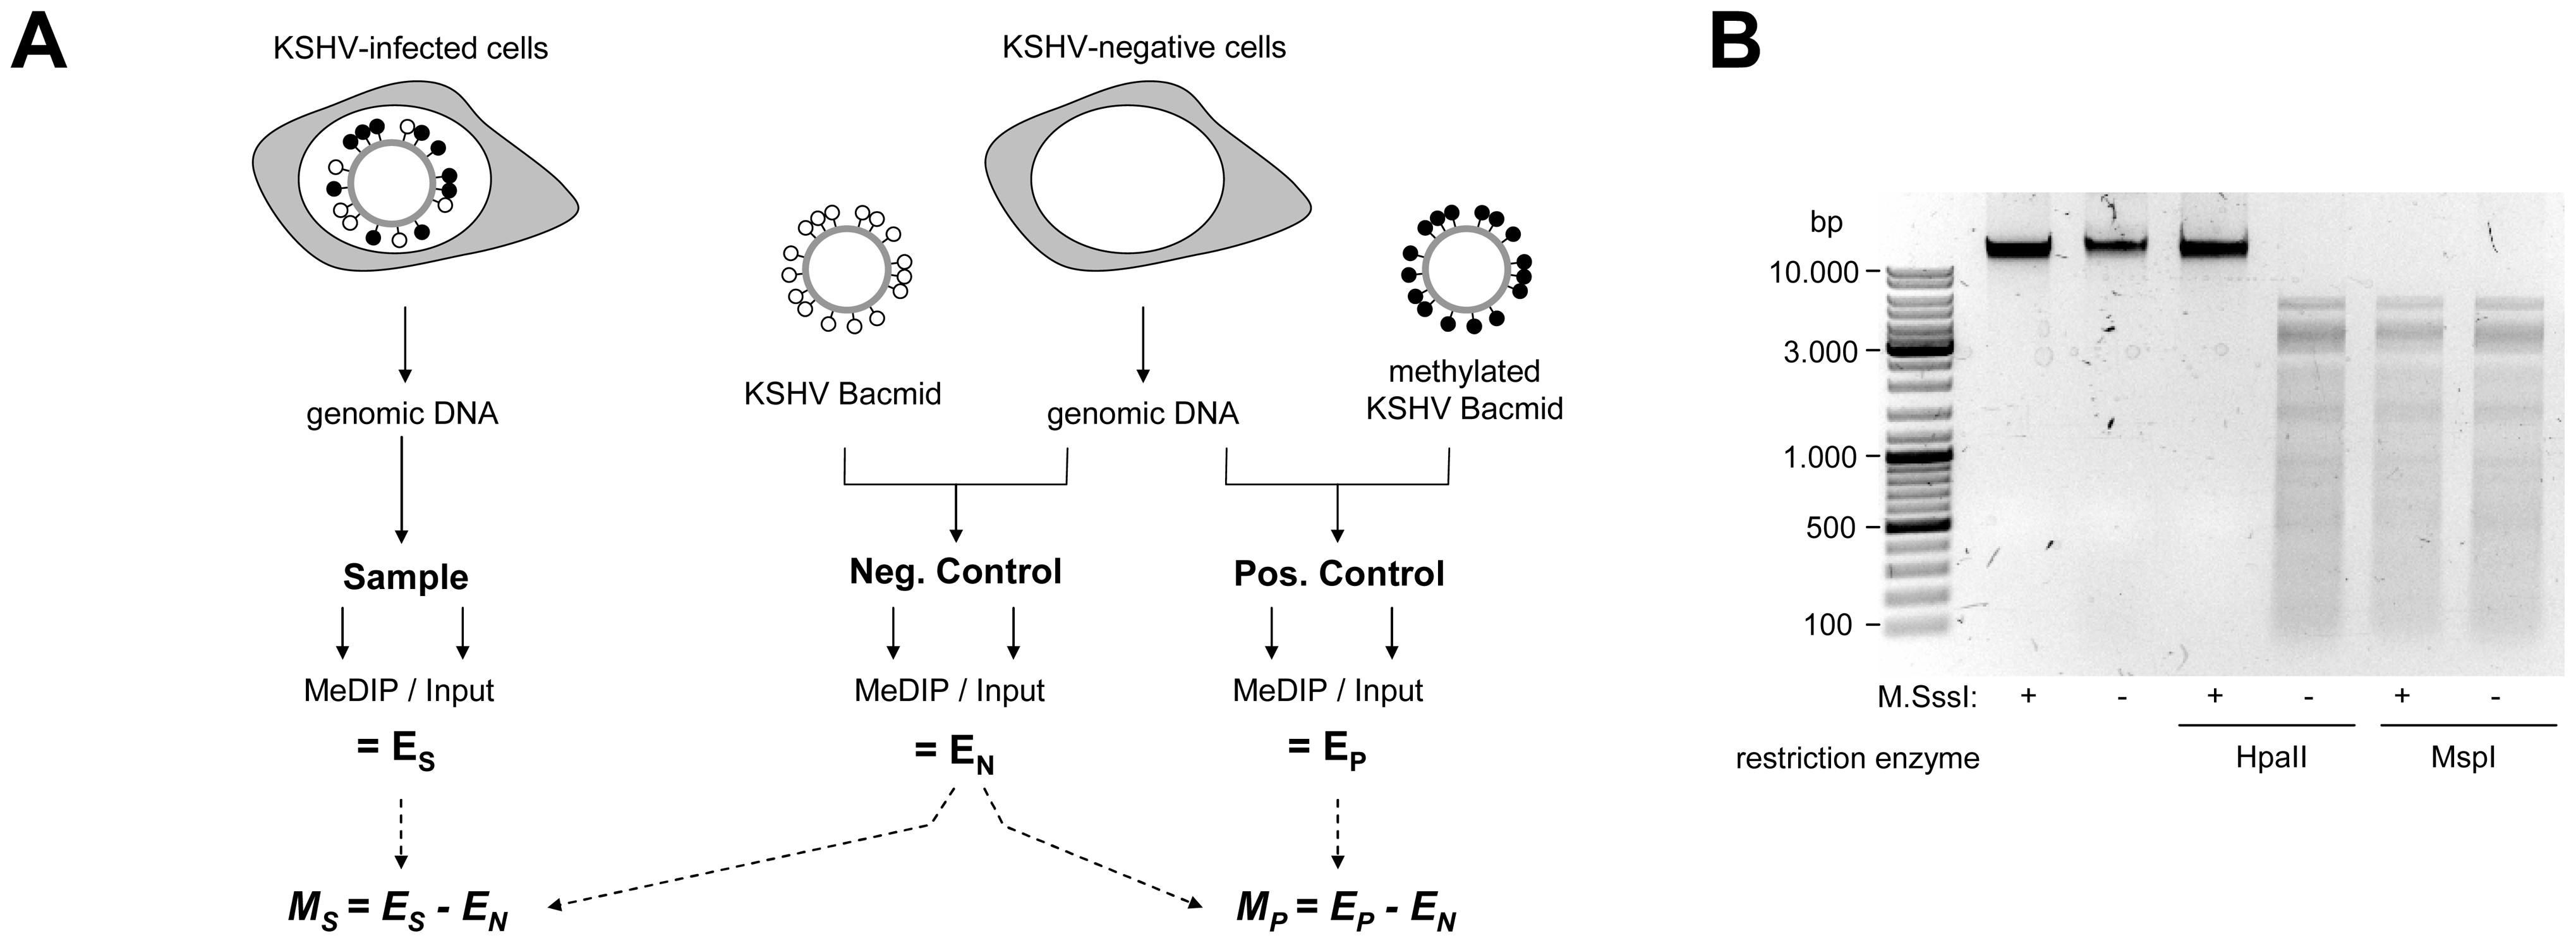 Experimental design of MeDIP analysis.